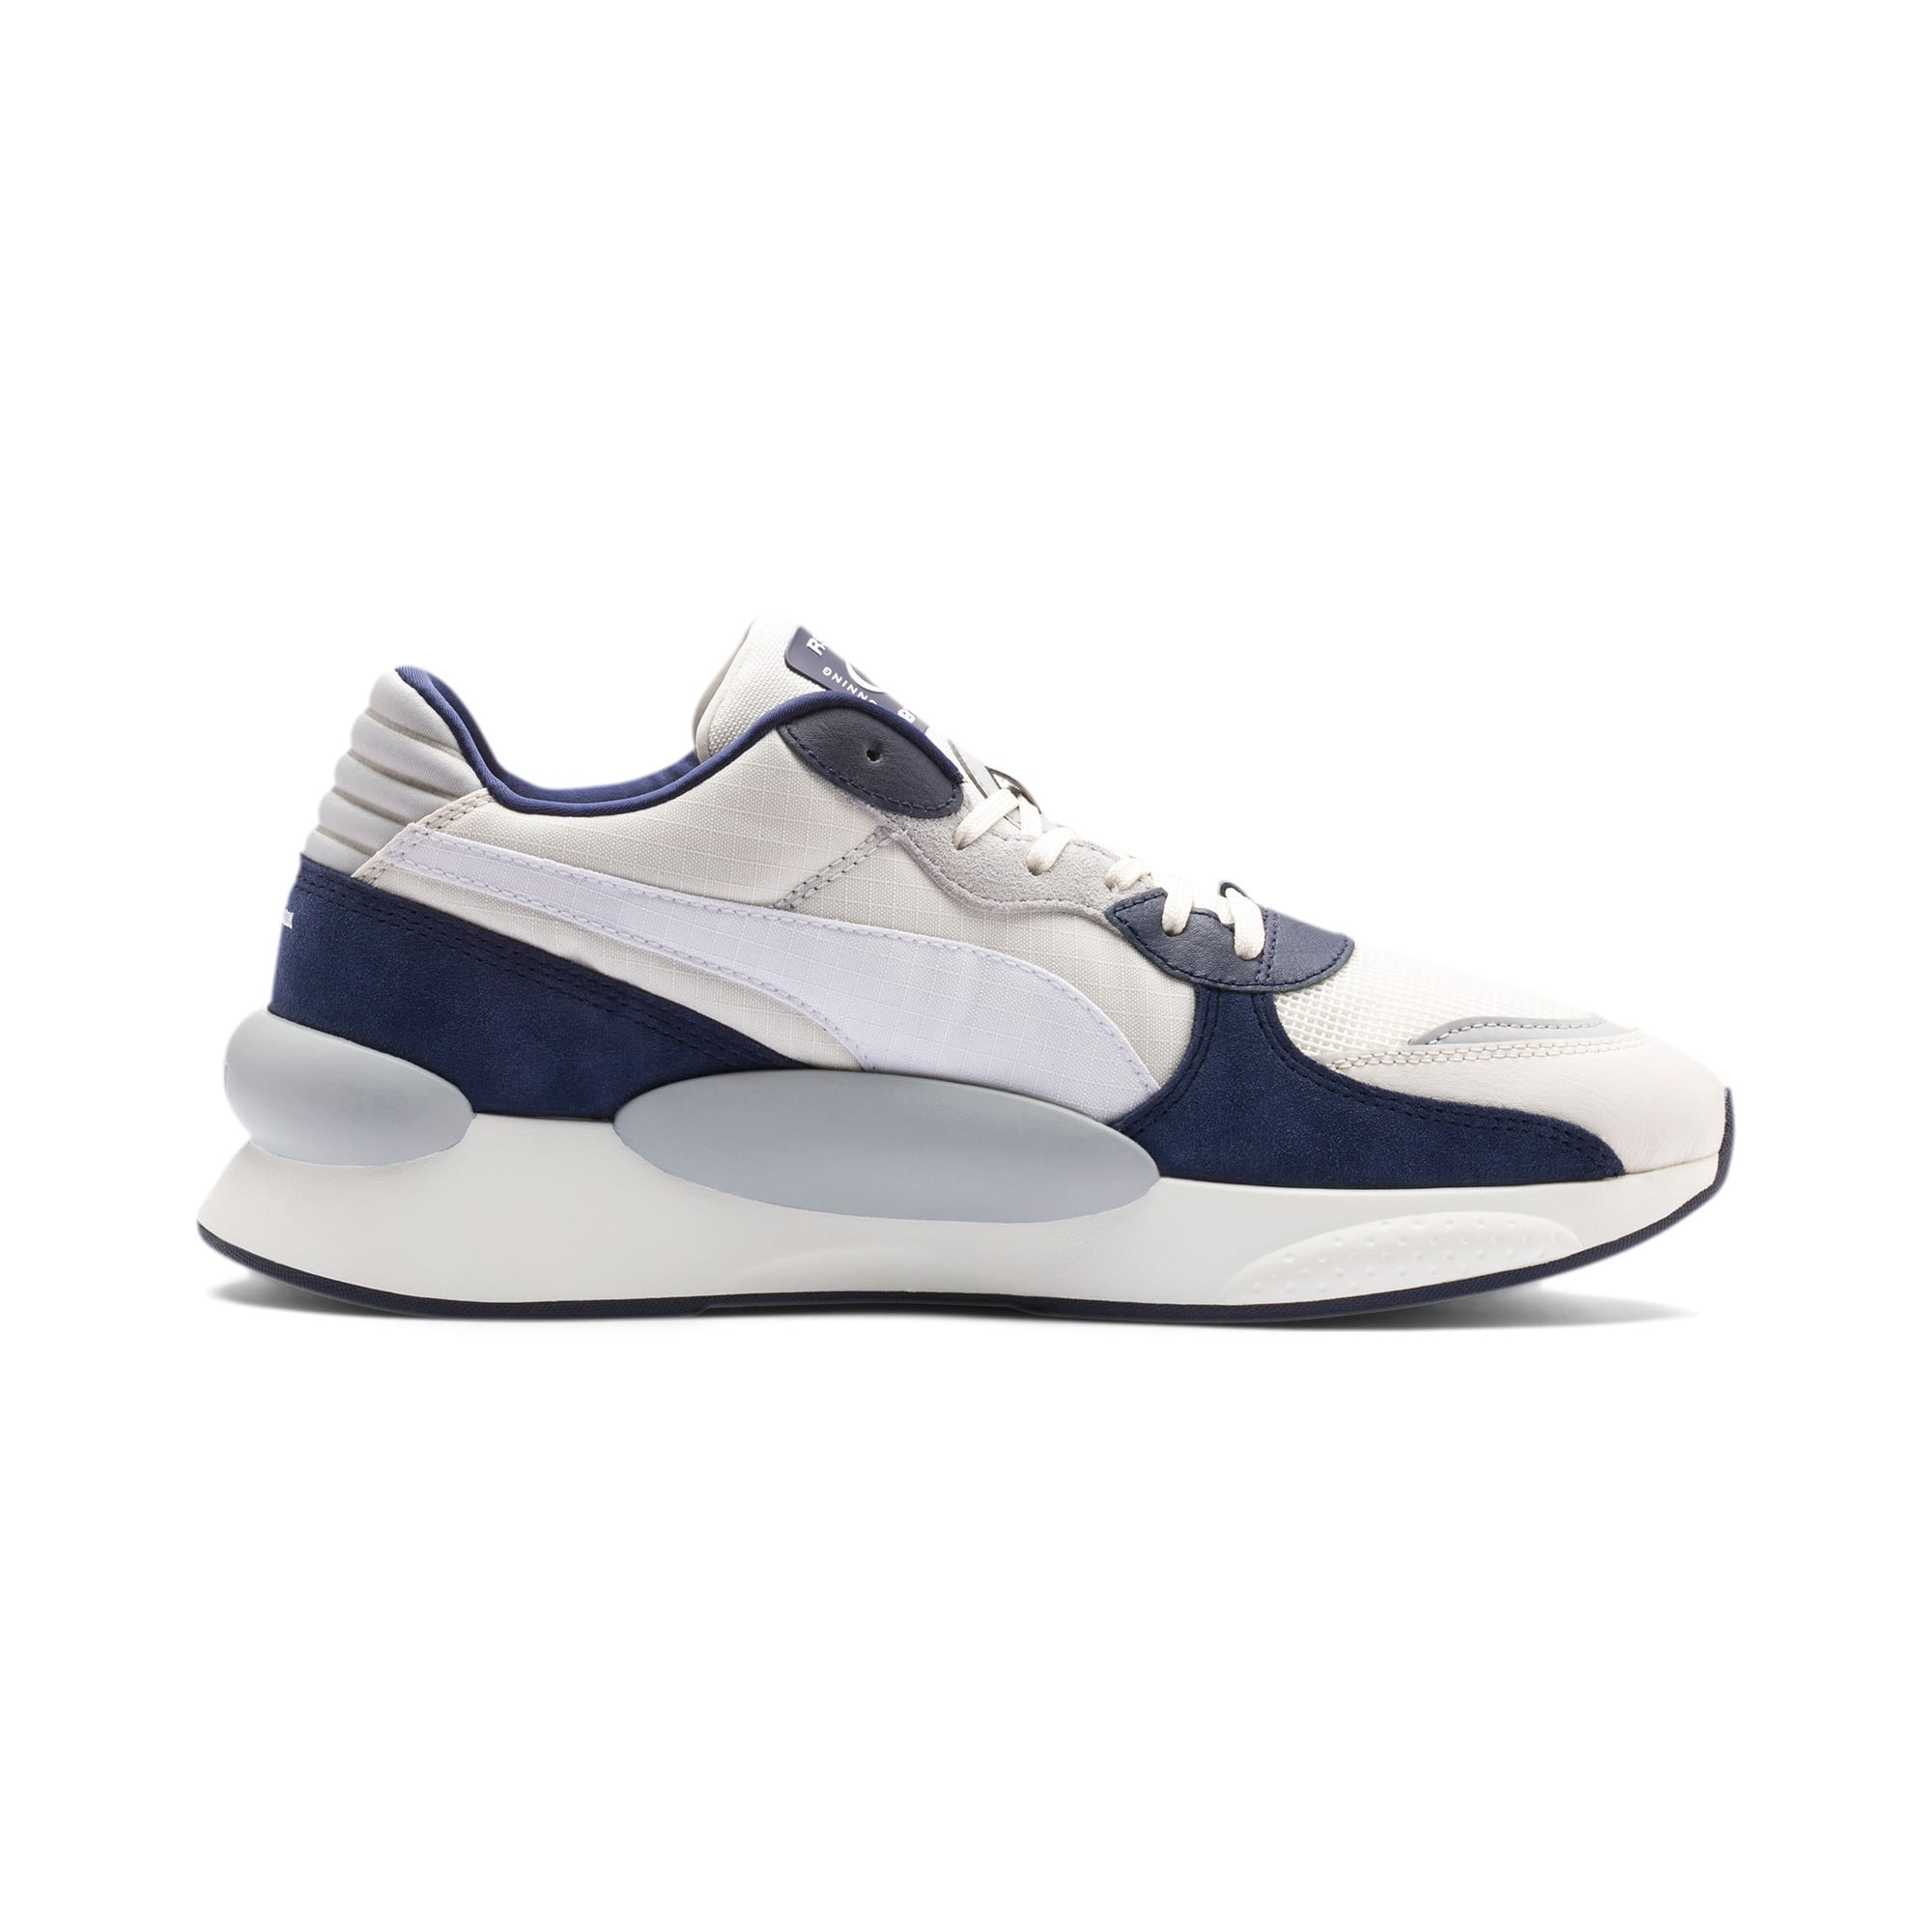 Thumbnail 5 of RS 9.8 Space Sneakers, Whisper White-Peacoat, medium